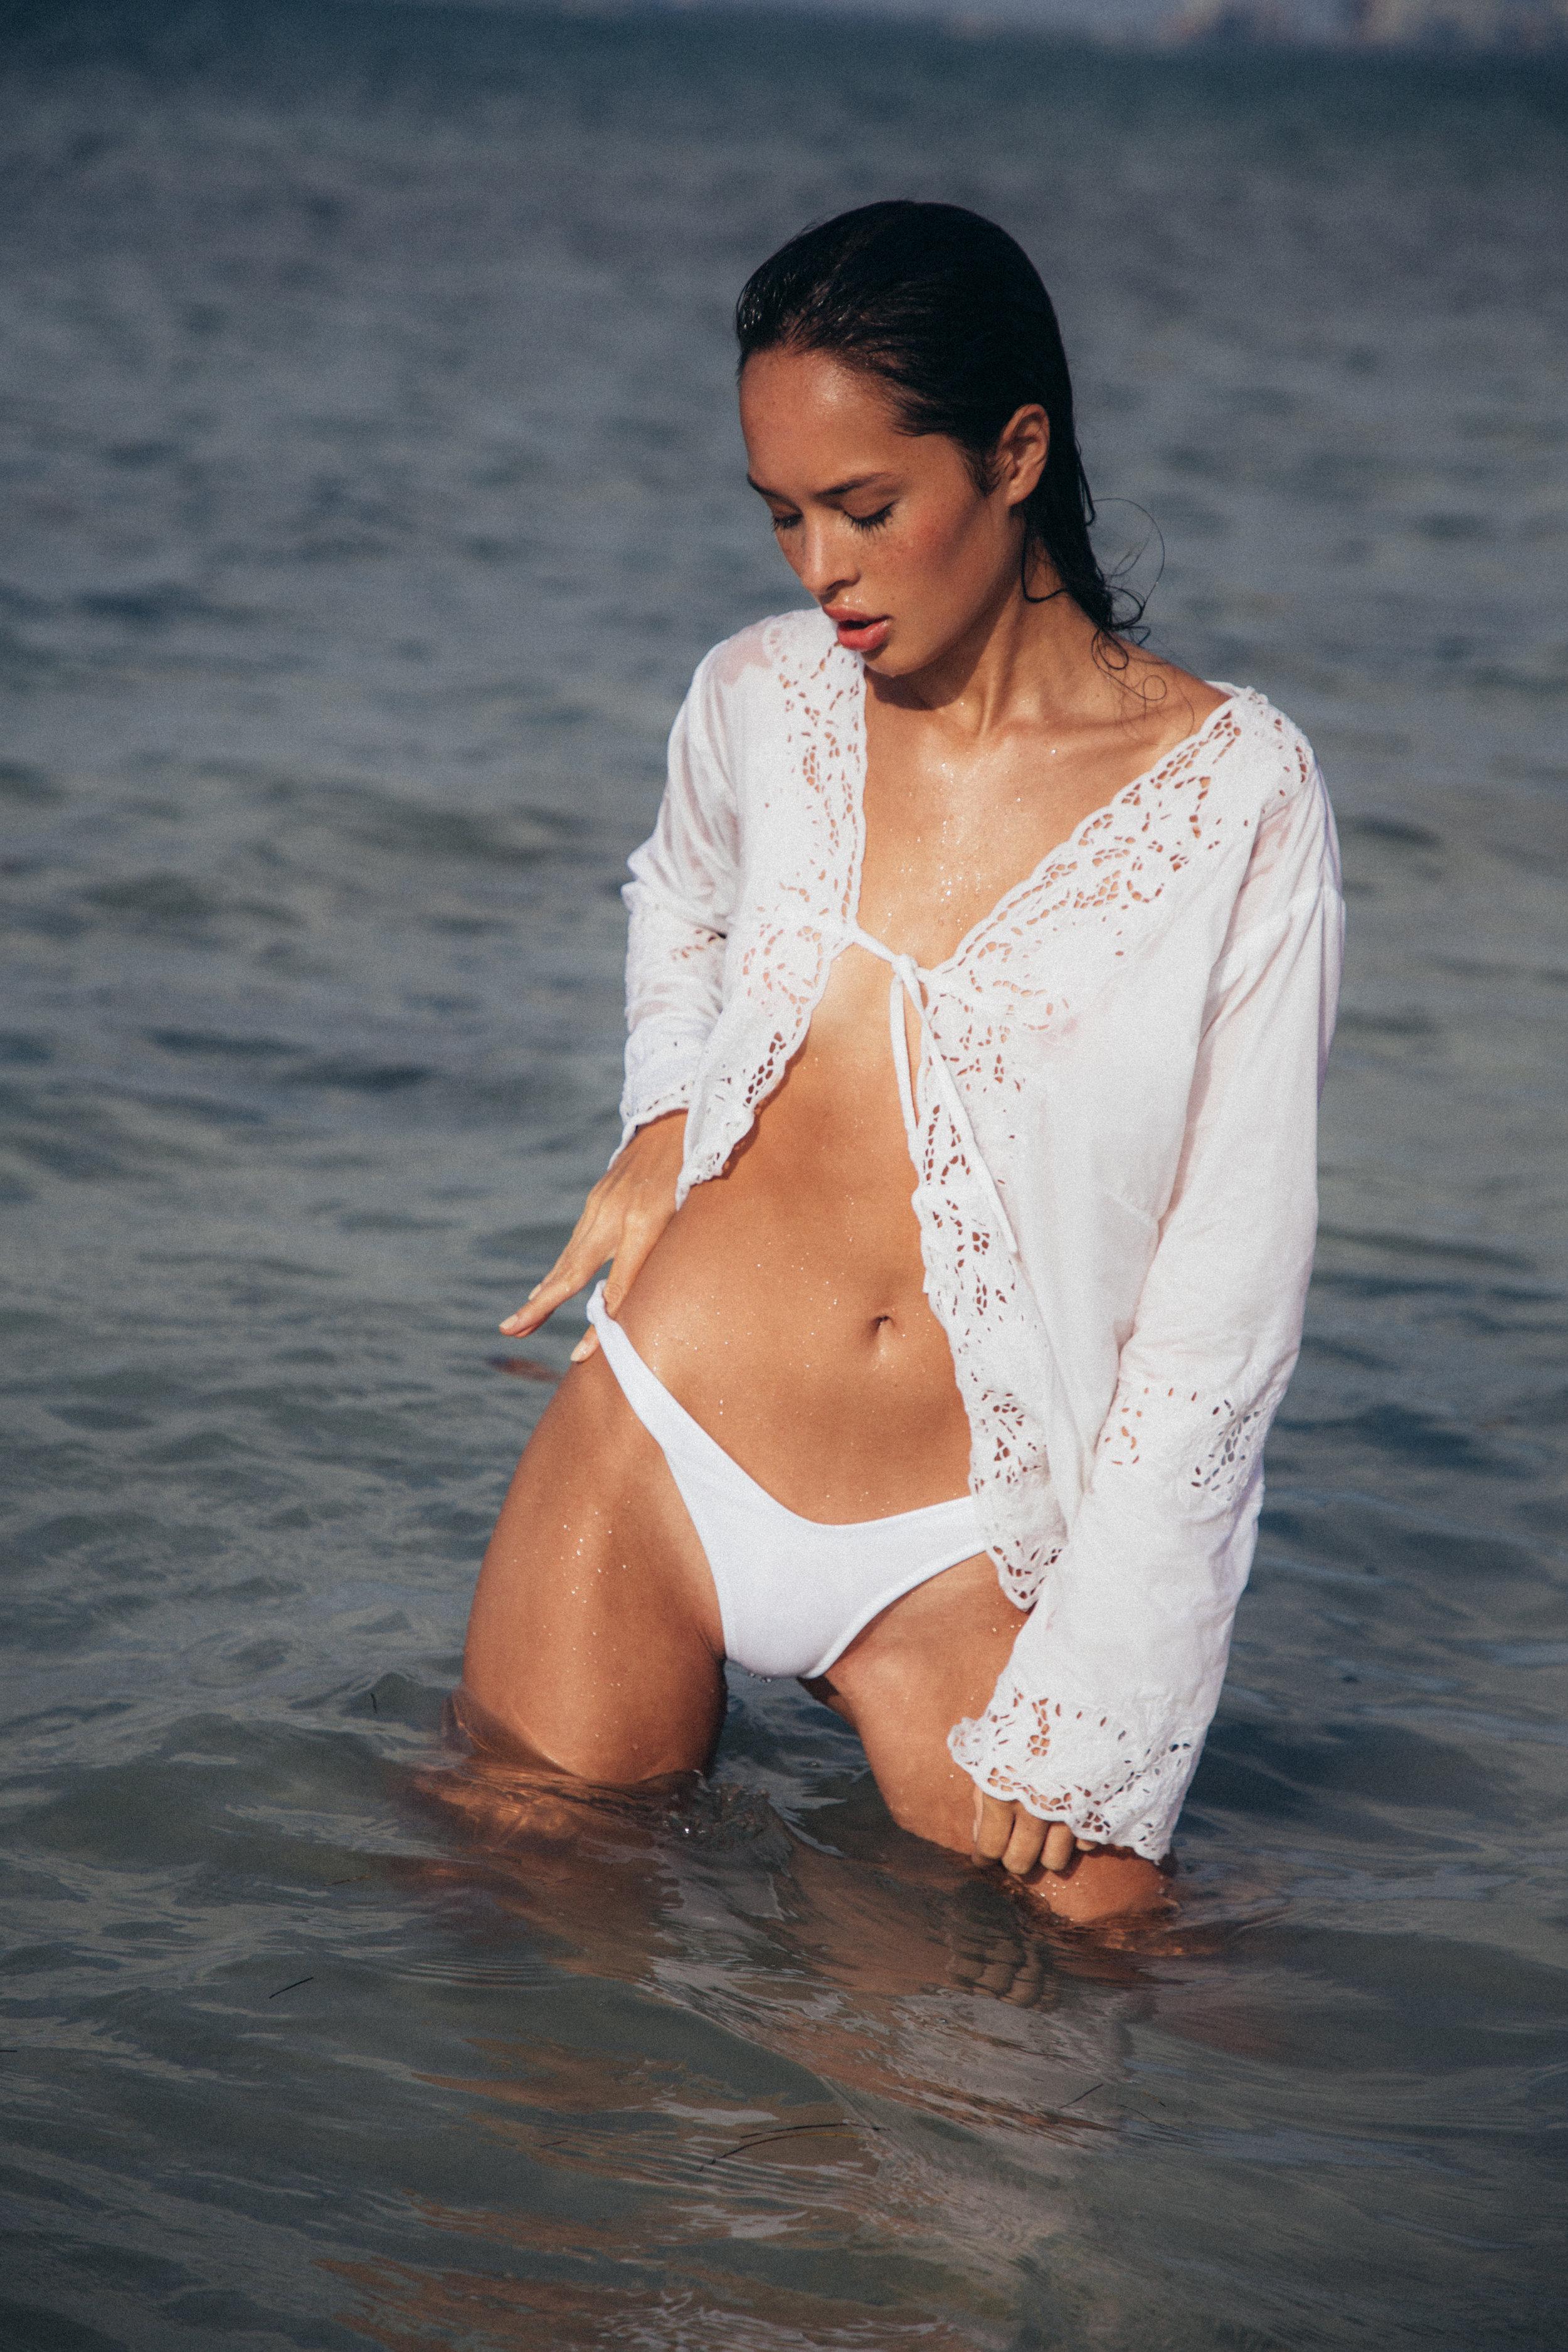 Beach-Vintage-26.jpg